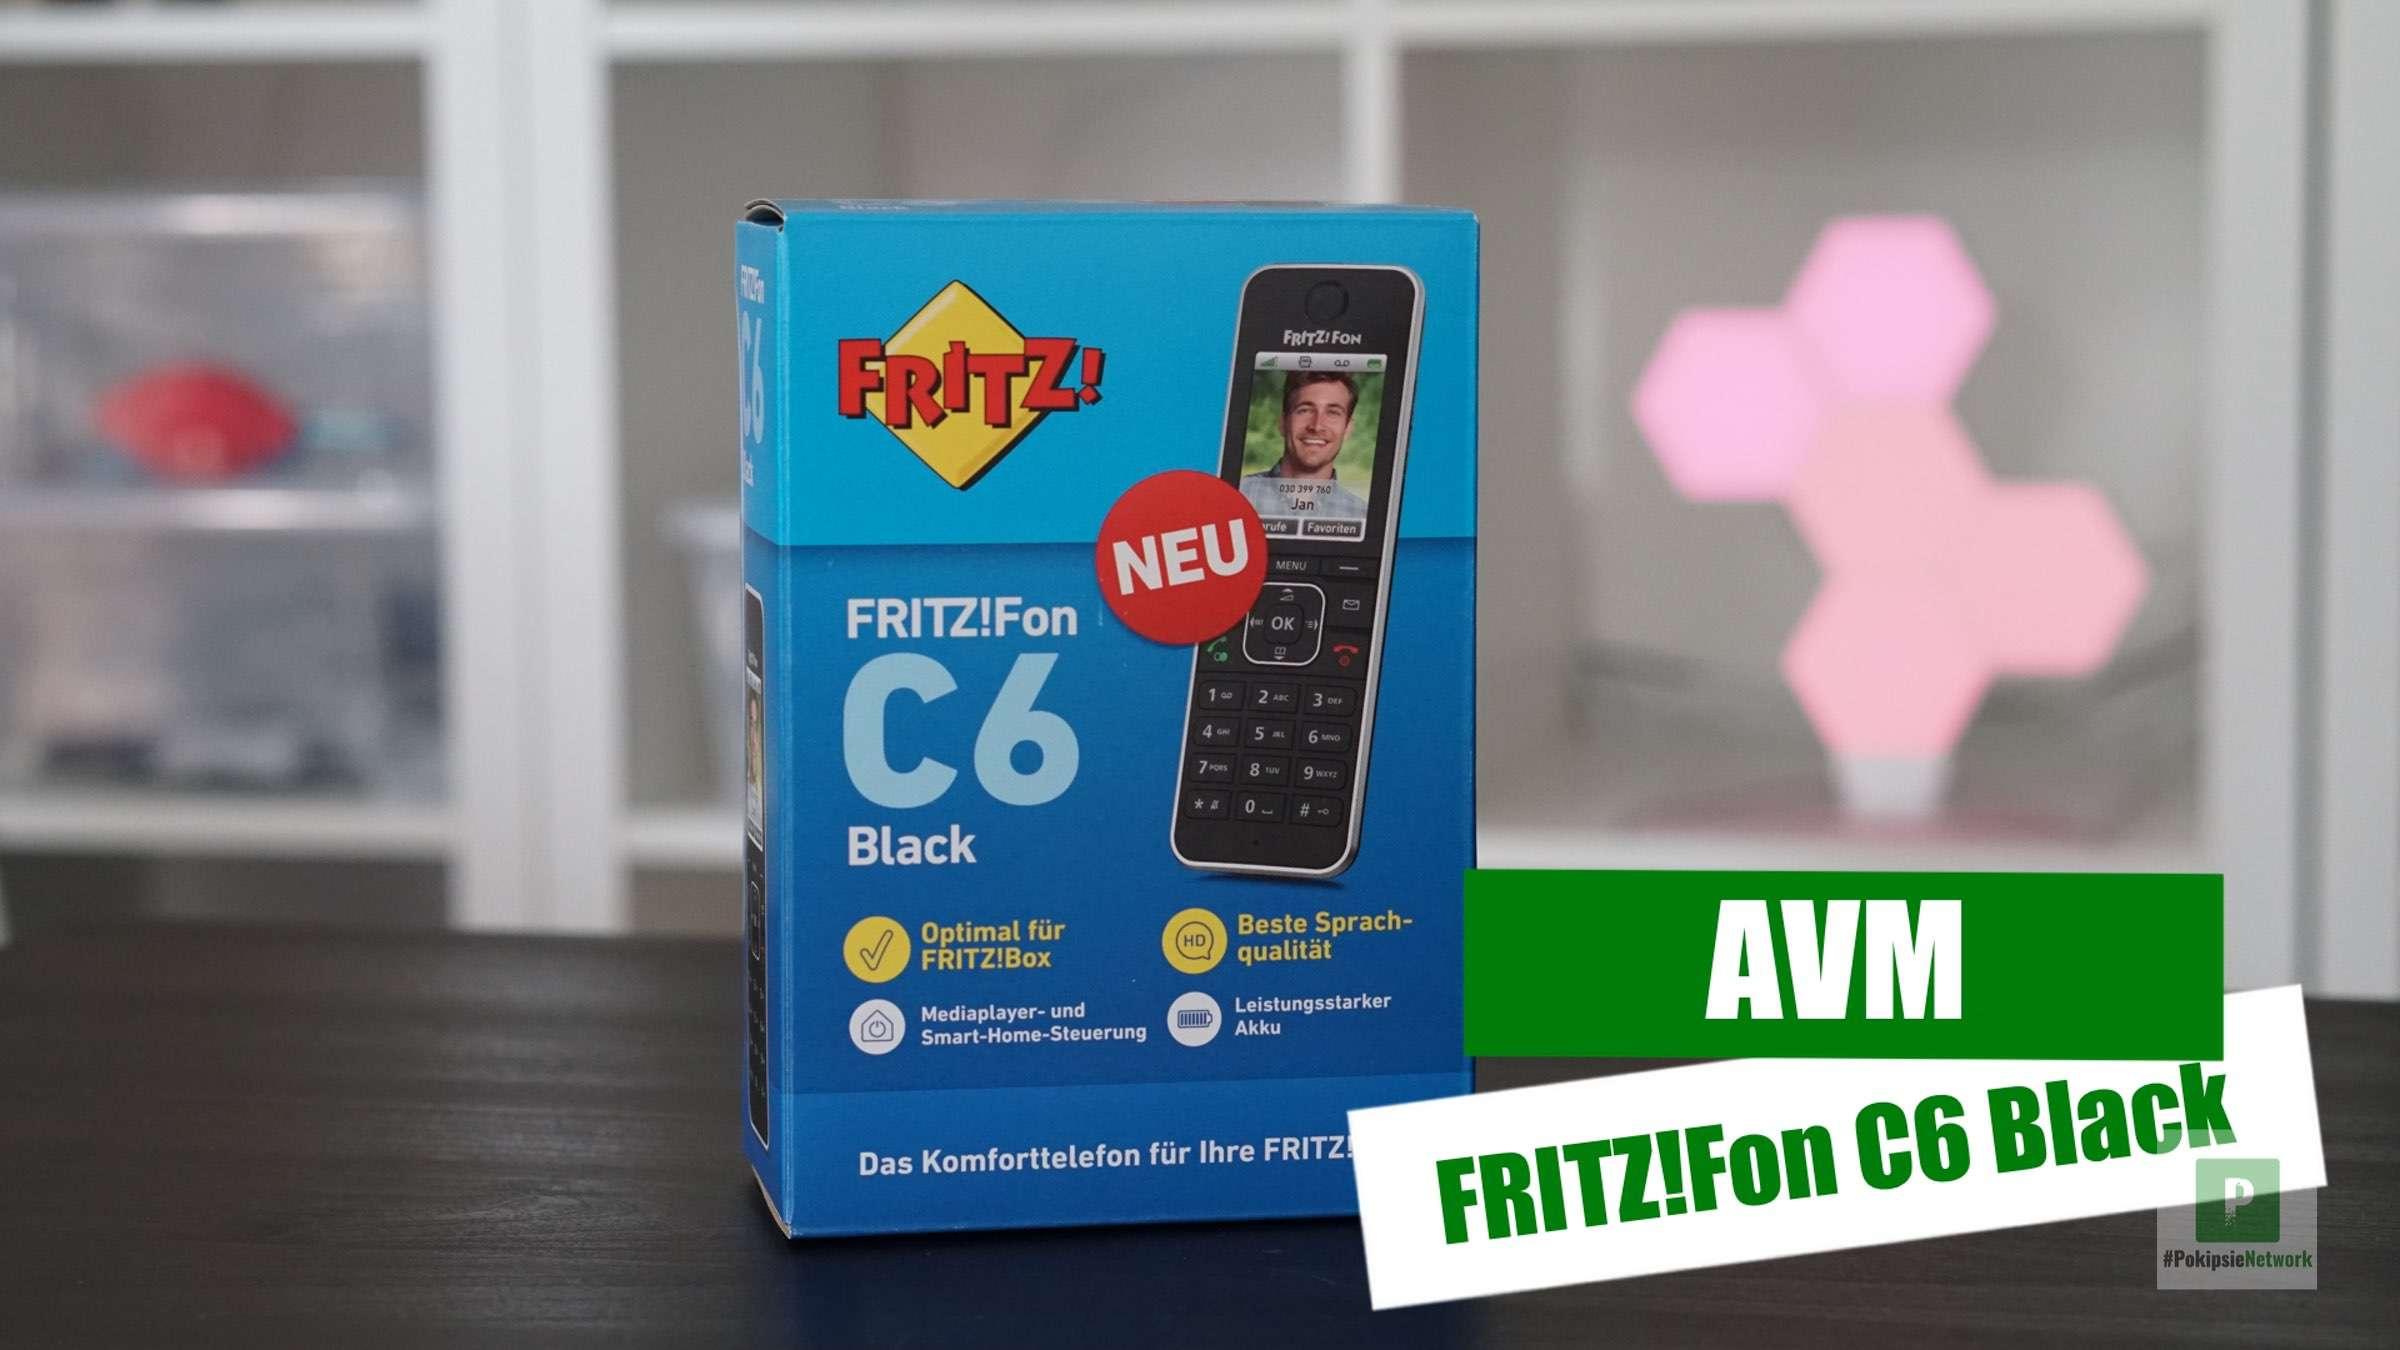 Video – AVM – FRITZ!Fon C6 Black